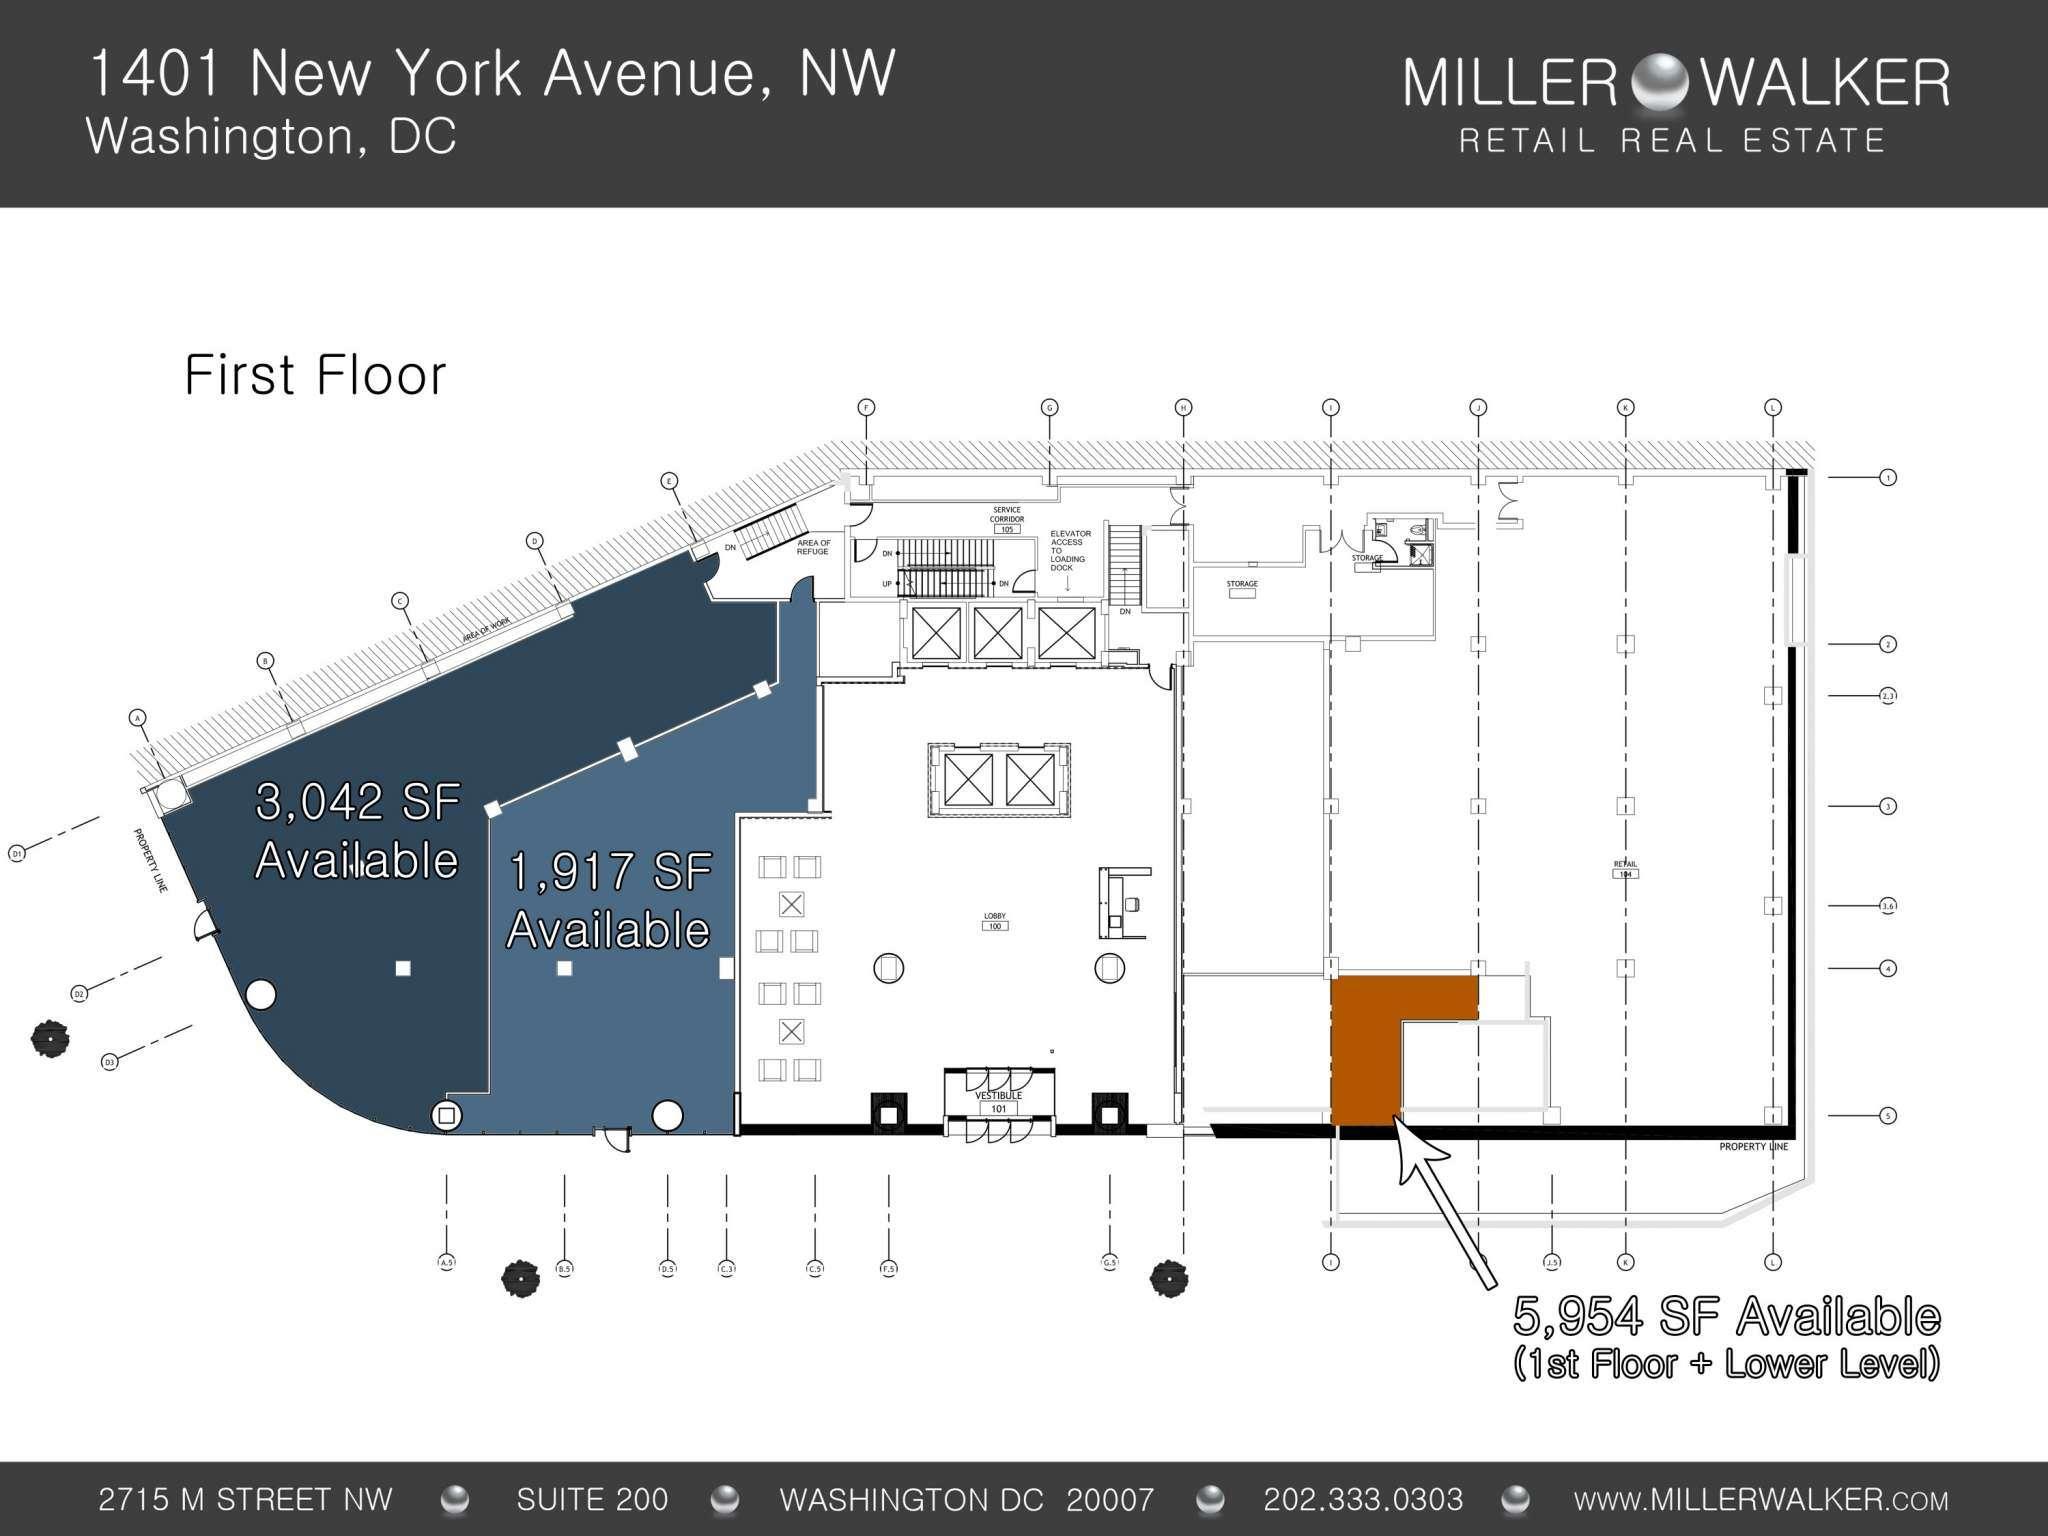 1401-new-york-avenue-floor-plans-9-30-2016_page_2-custom